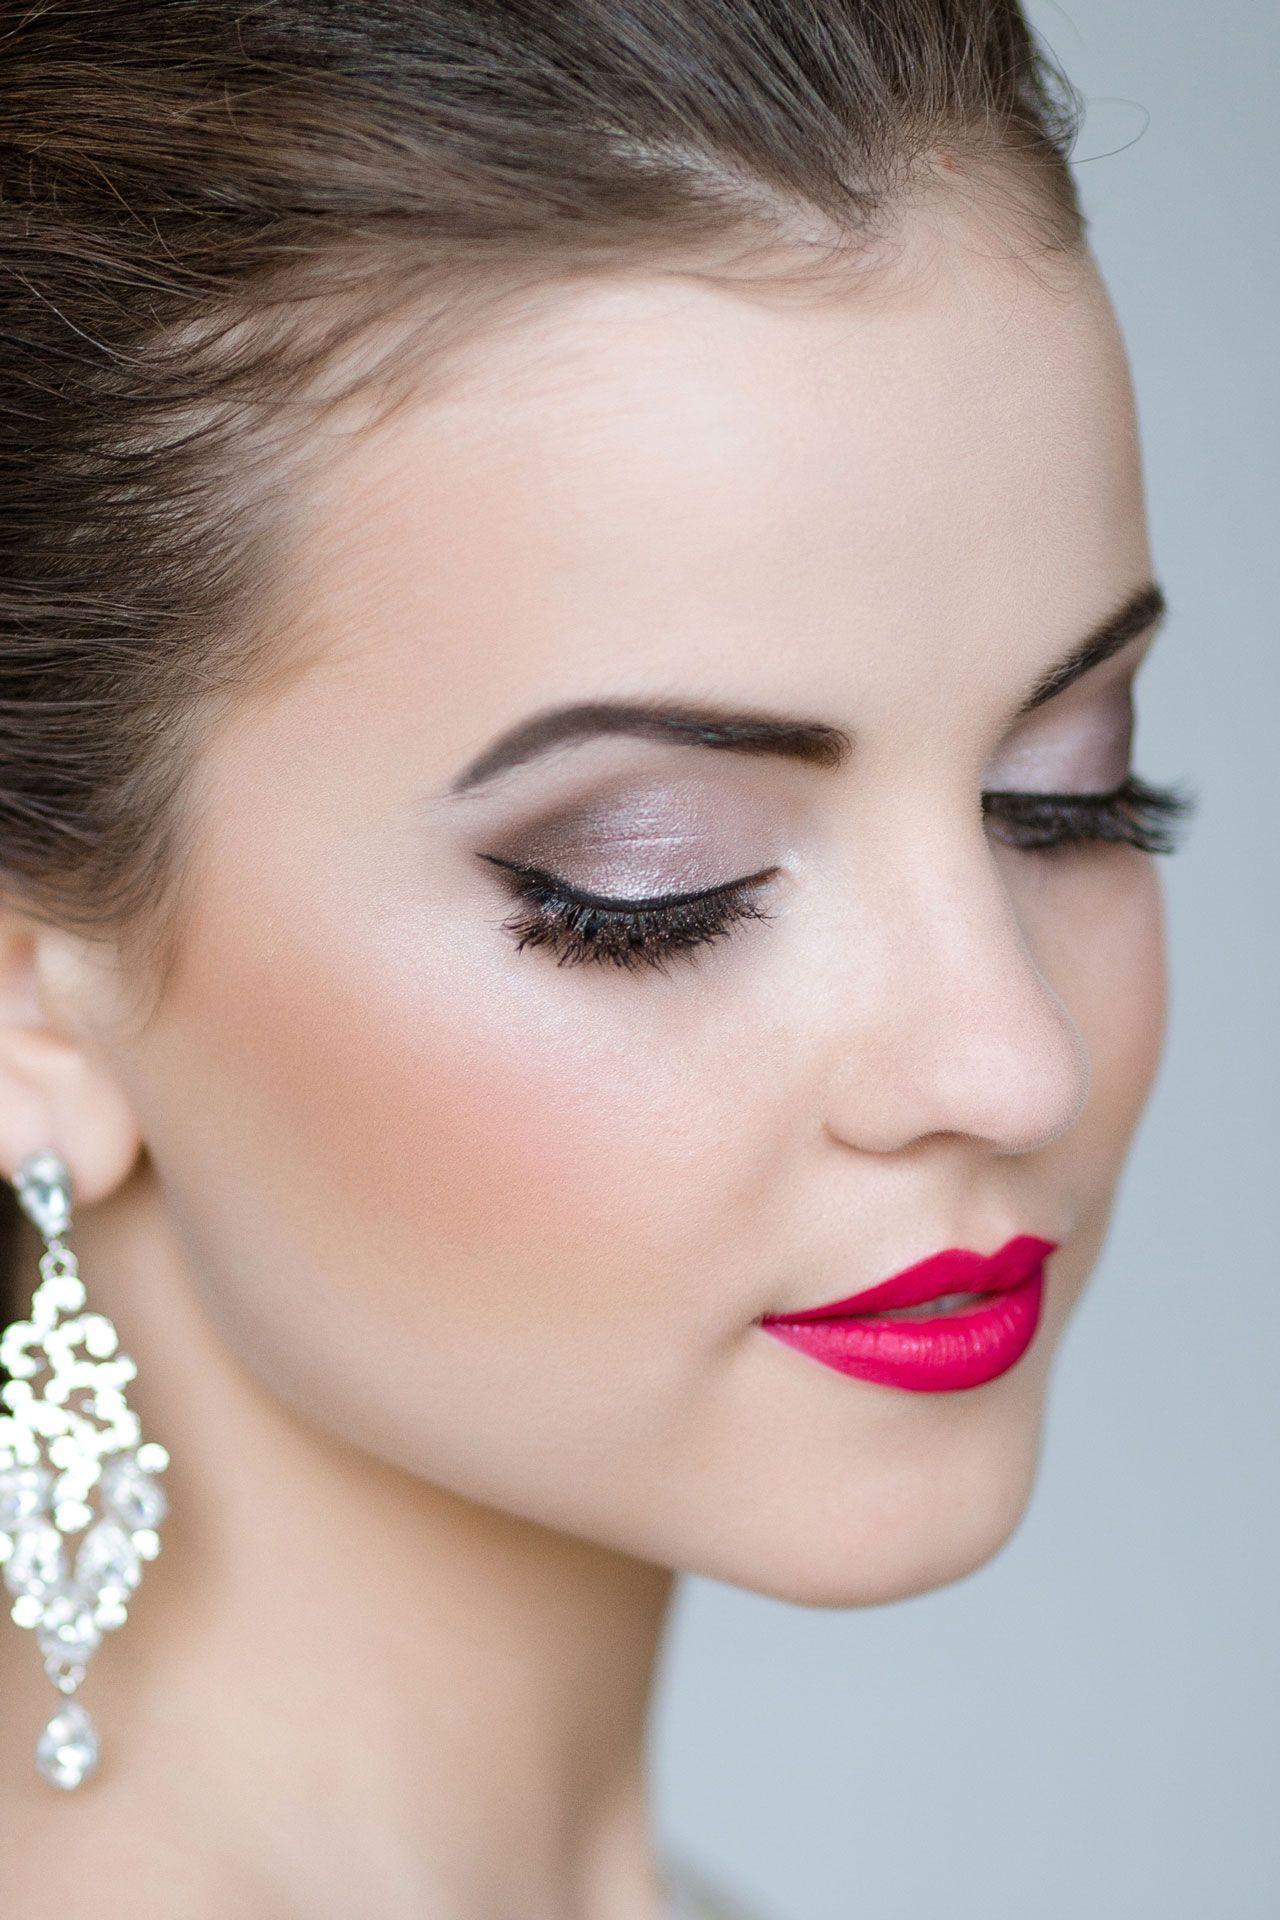 макияж невесте на свадьбу